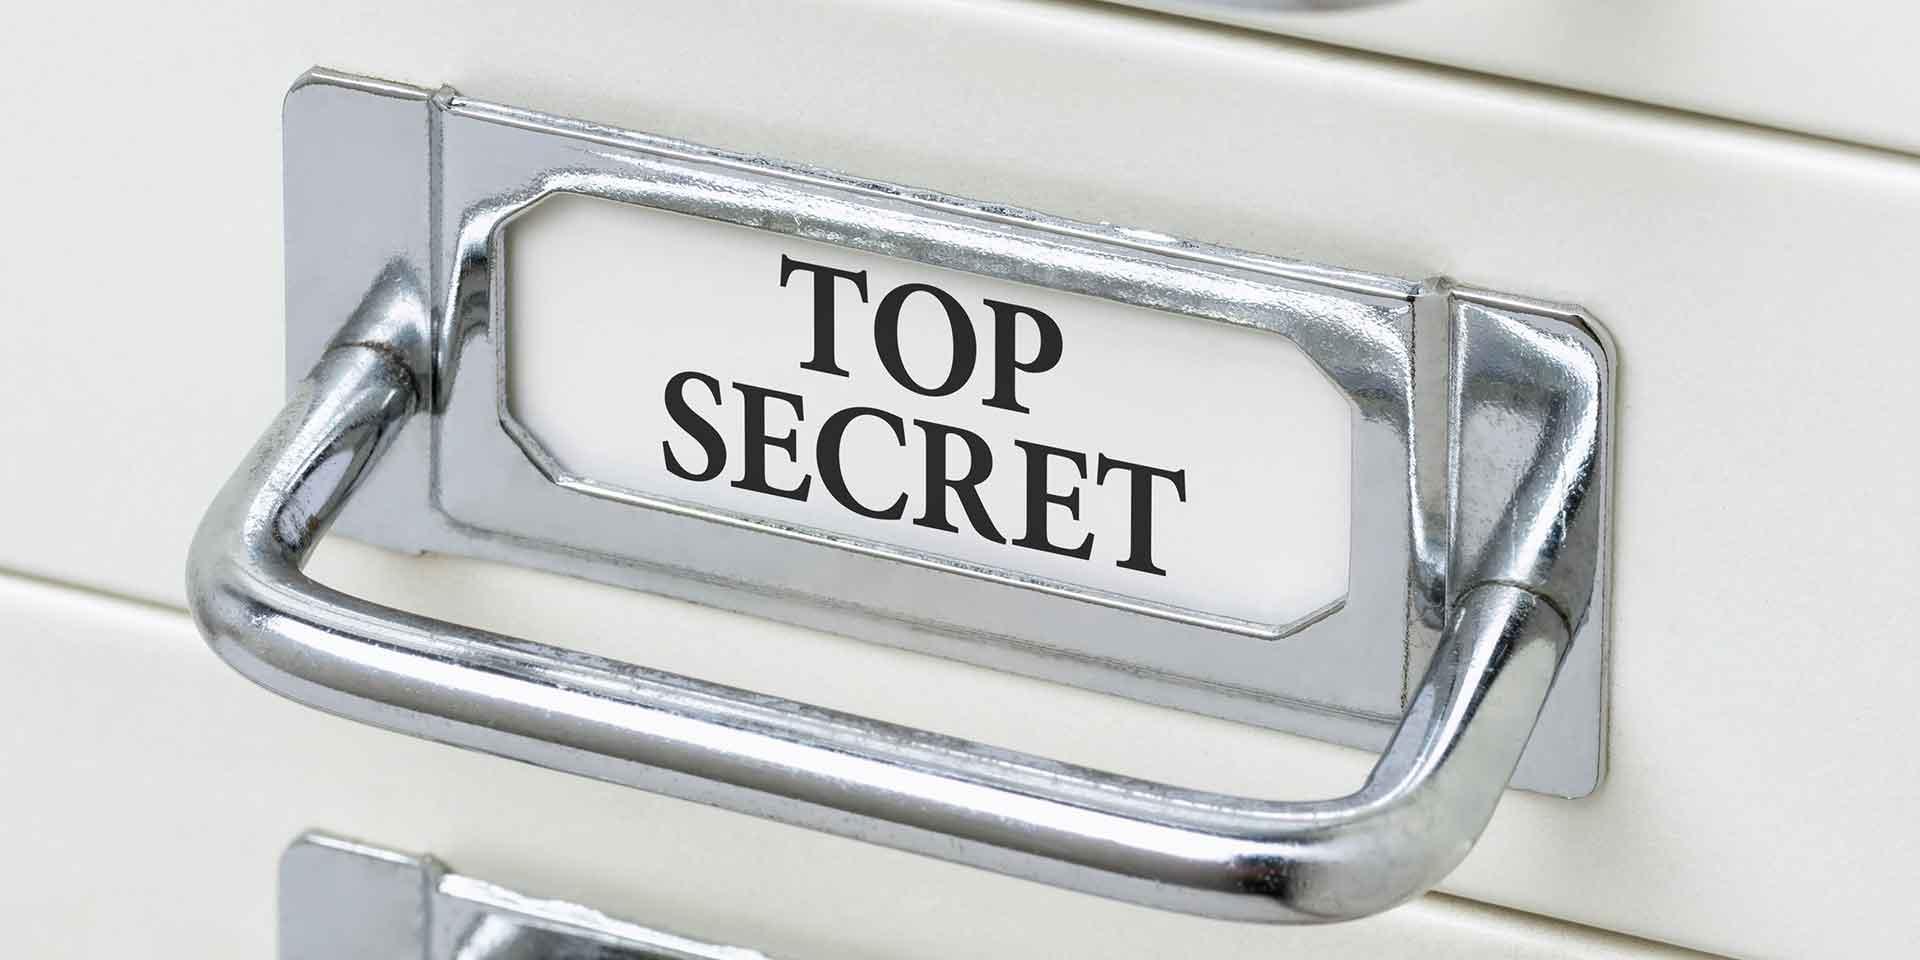 Top secret drawer